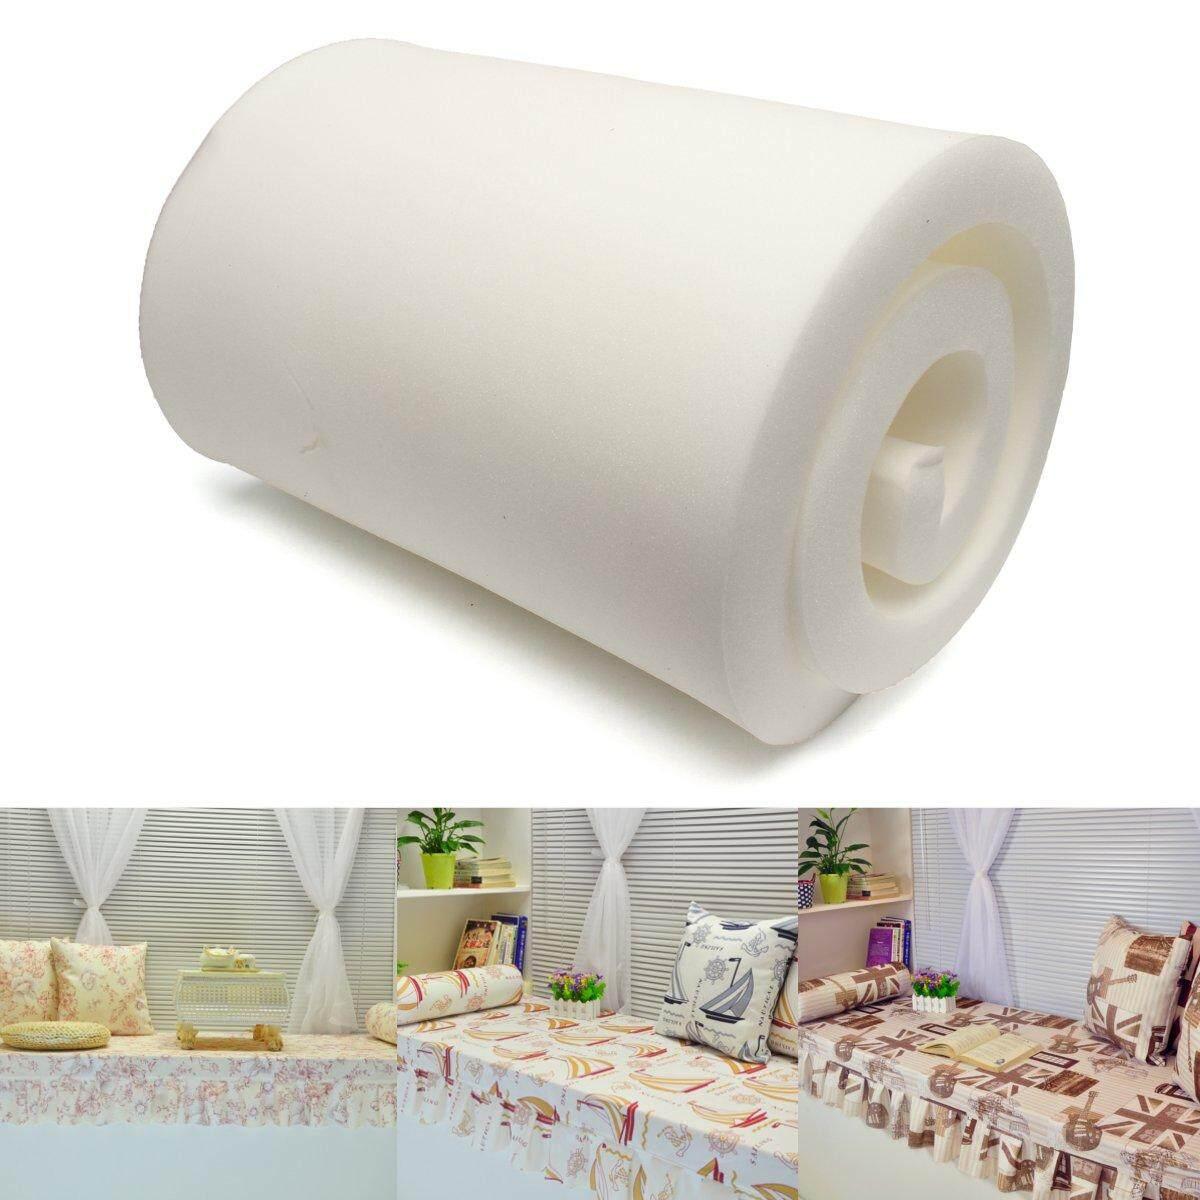 79X24 Upholstery White High Density Foam Sofa Cushion Rubber Sheets Seat Pad